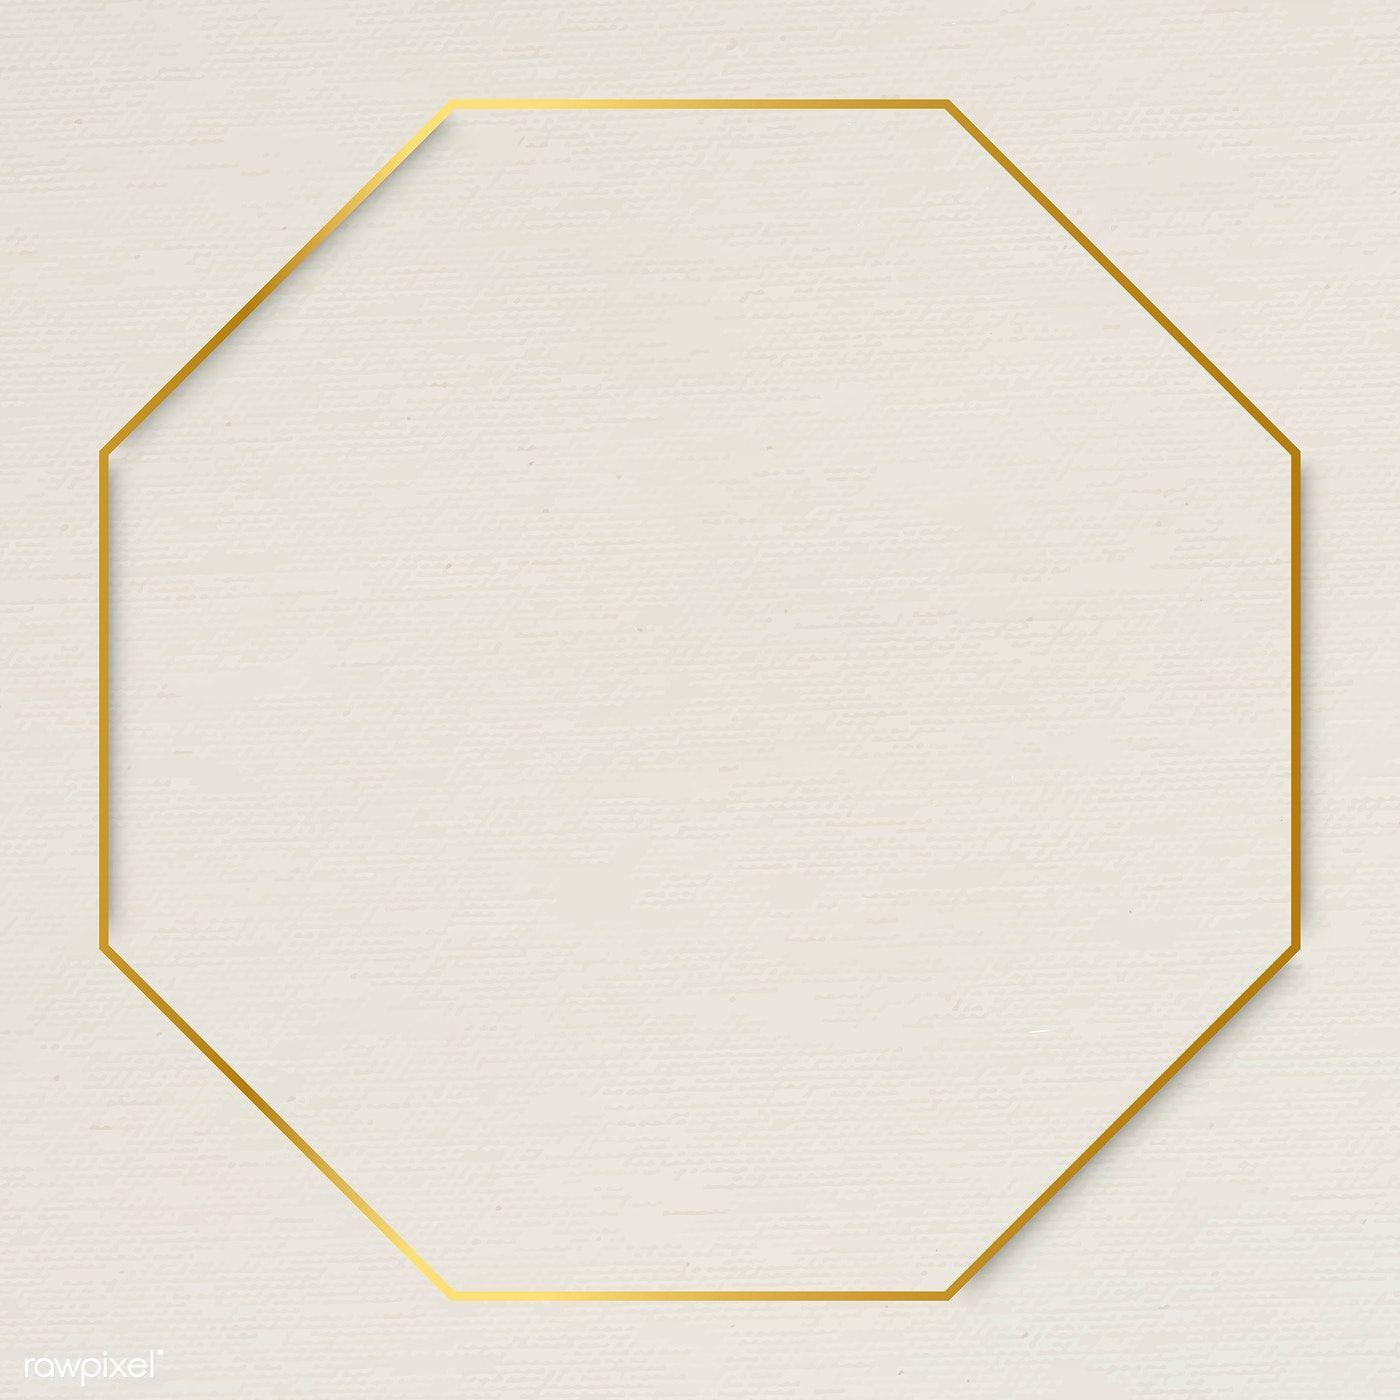 Octagon Gold Frame On Beige Background Vector Premium Image By Rawpixel Com Te Beige Background Gold Frame Frame Logo